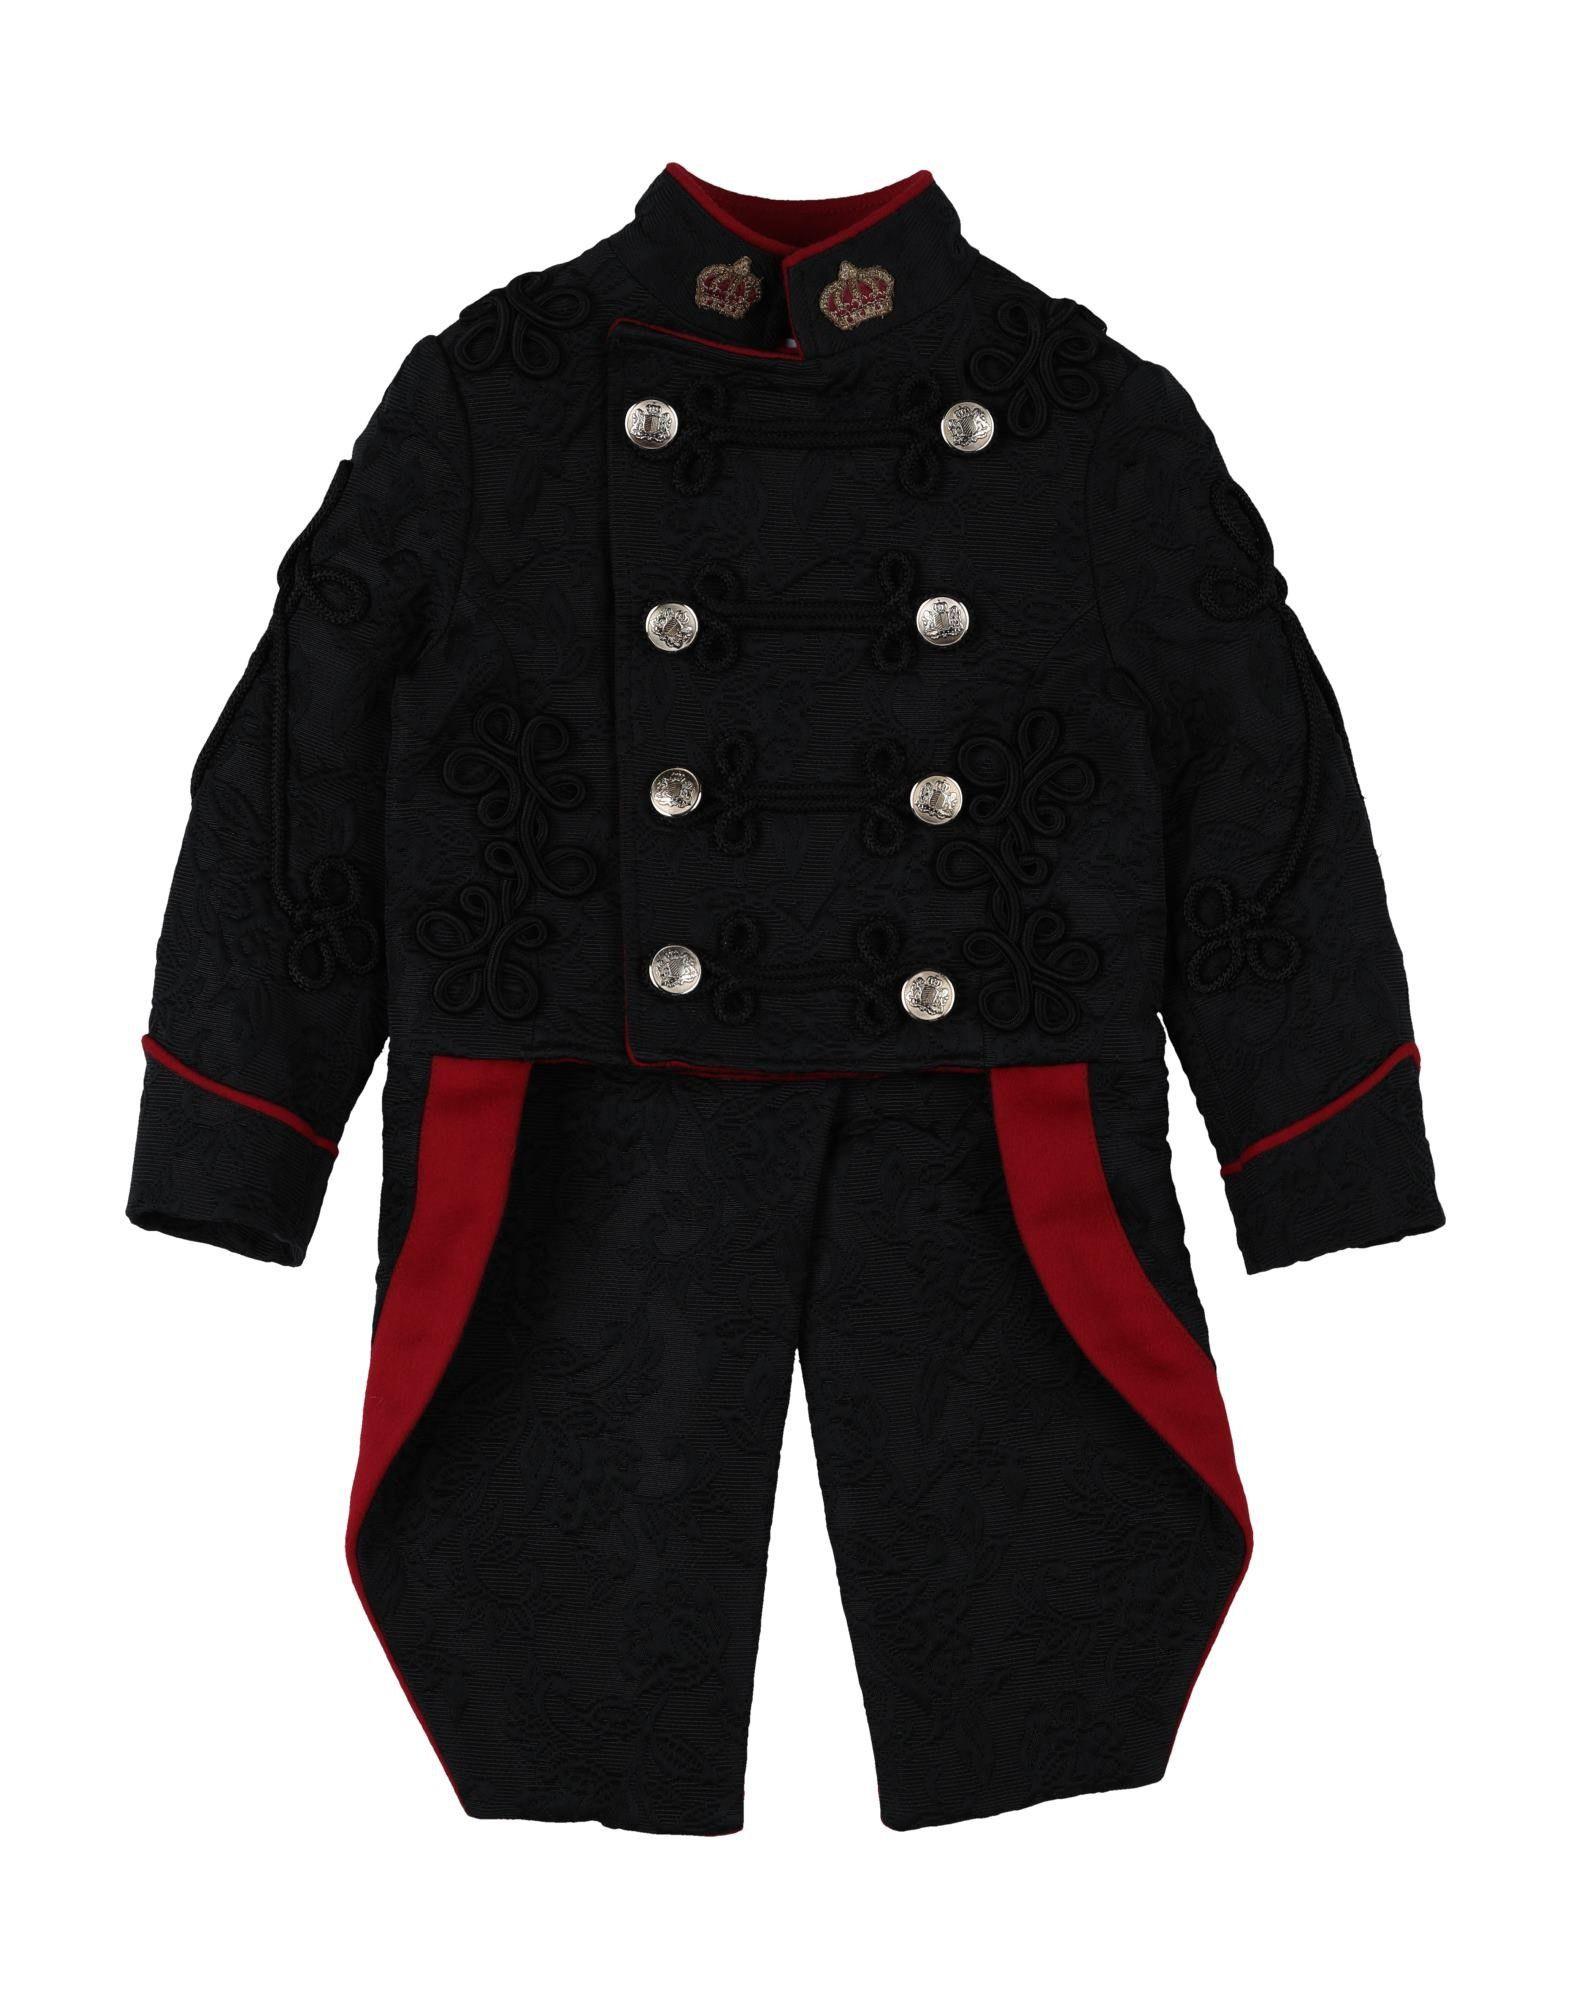 Dolce & Gabbana Kids' Suit Jackets In Black